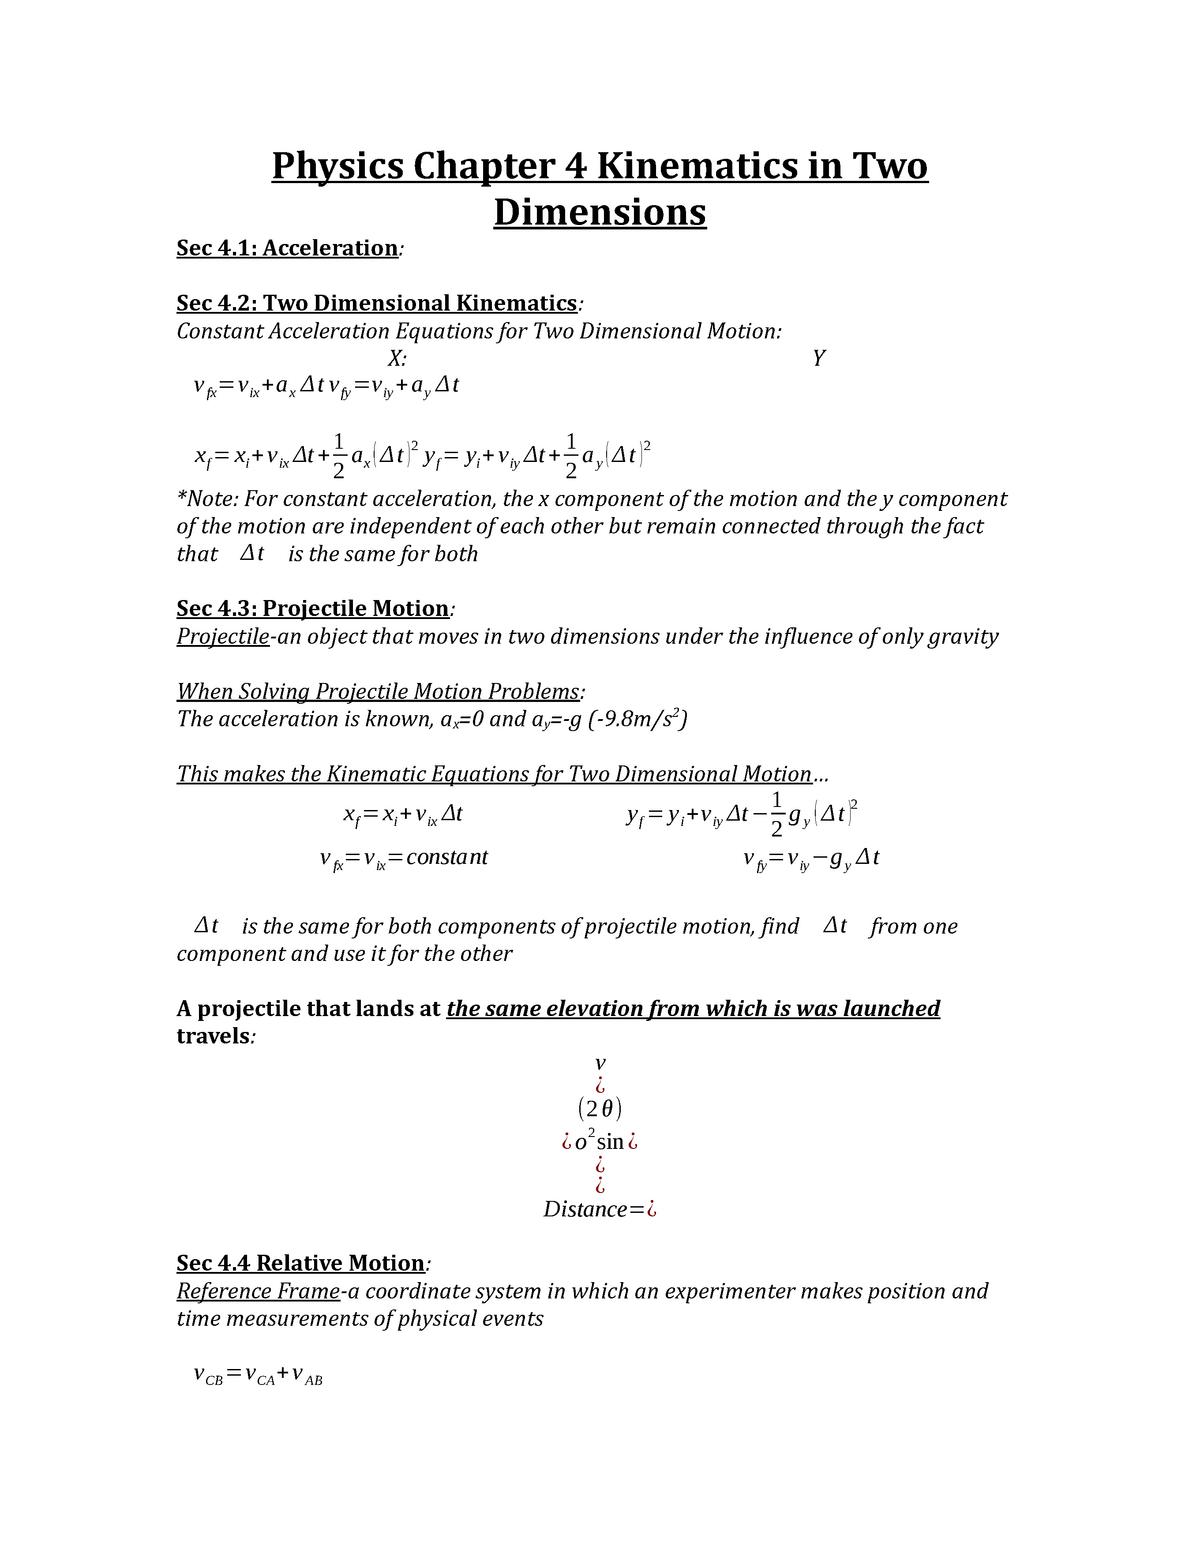 �yf�y�l9k�yi����9�+_PhysicsChapter4KinematicsinTwoDimensions-PH211-StuDocu